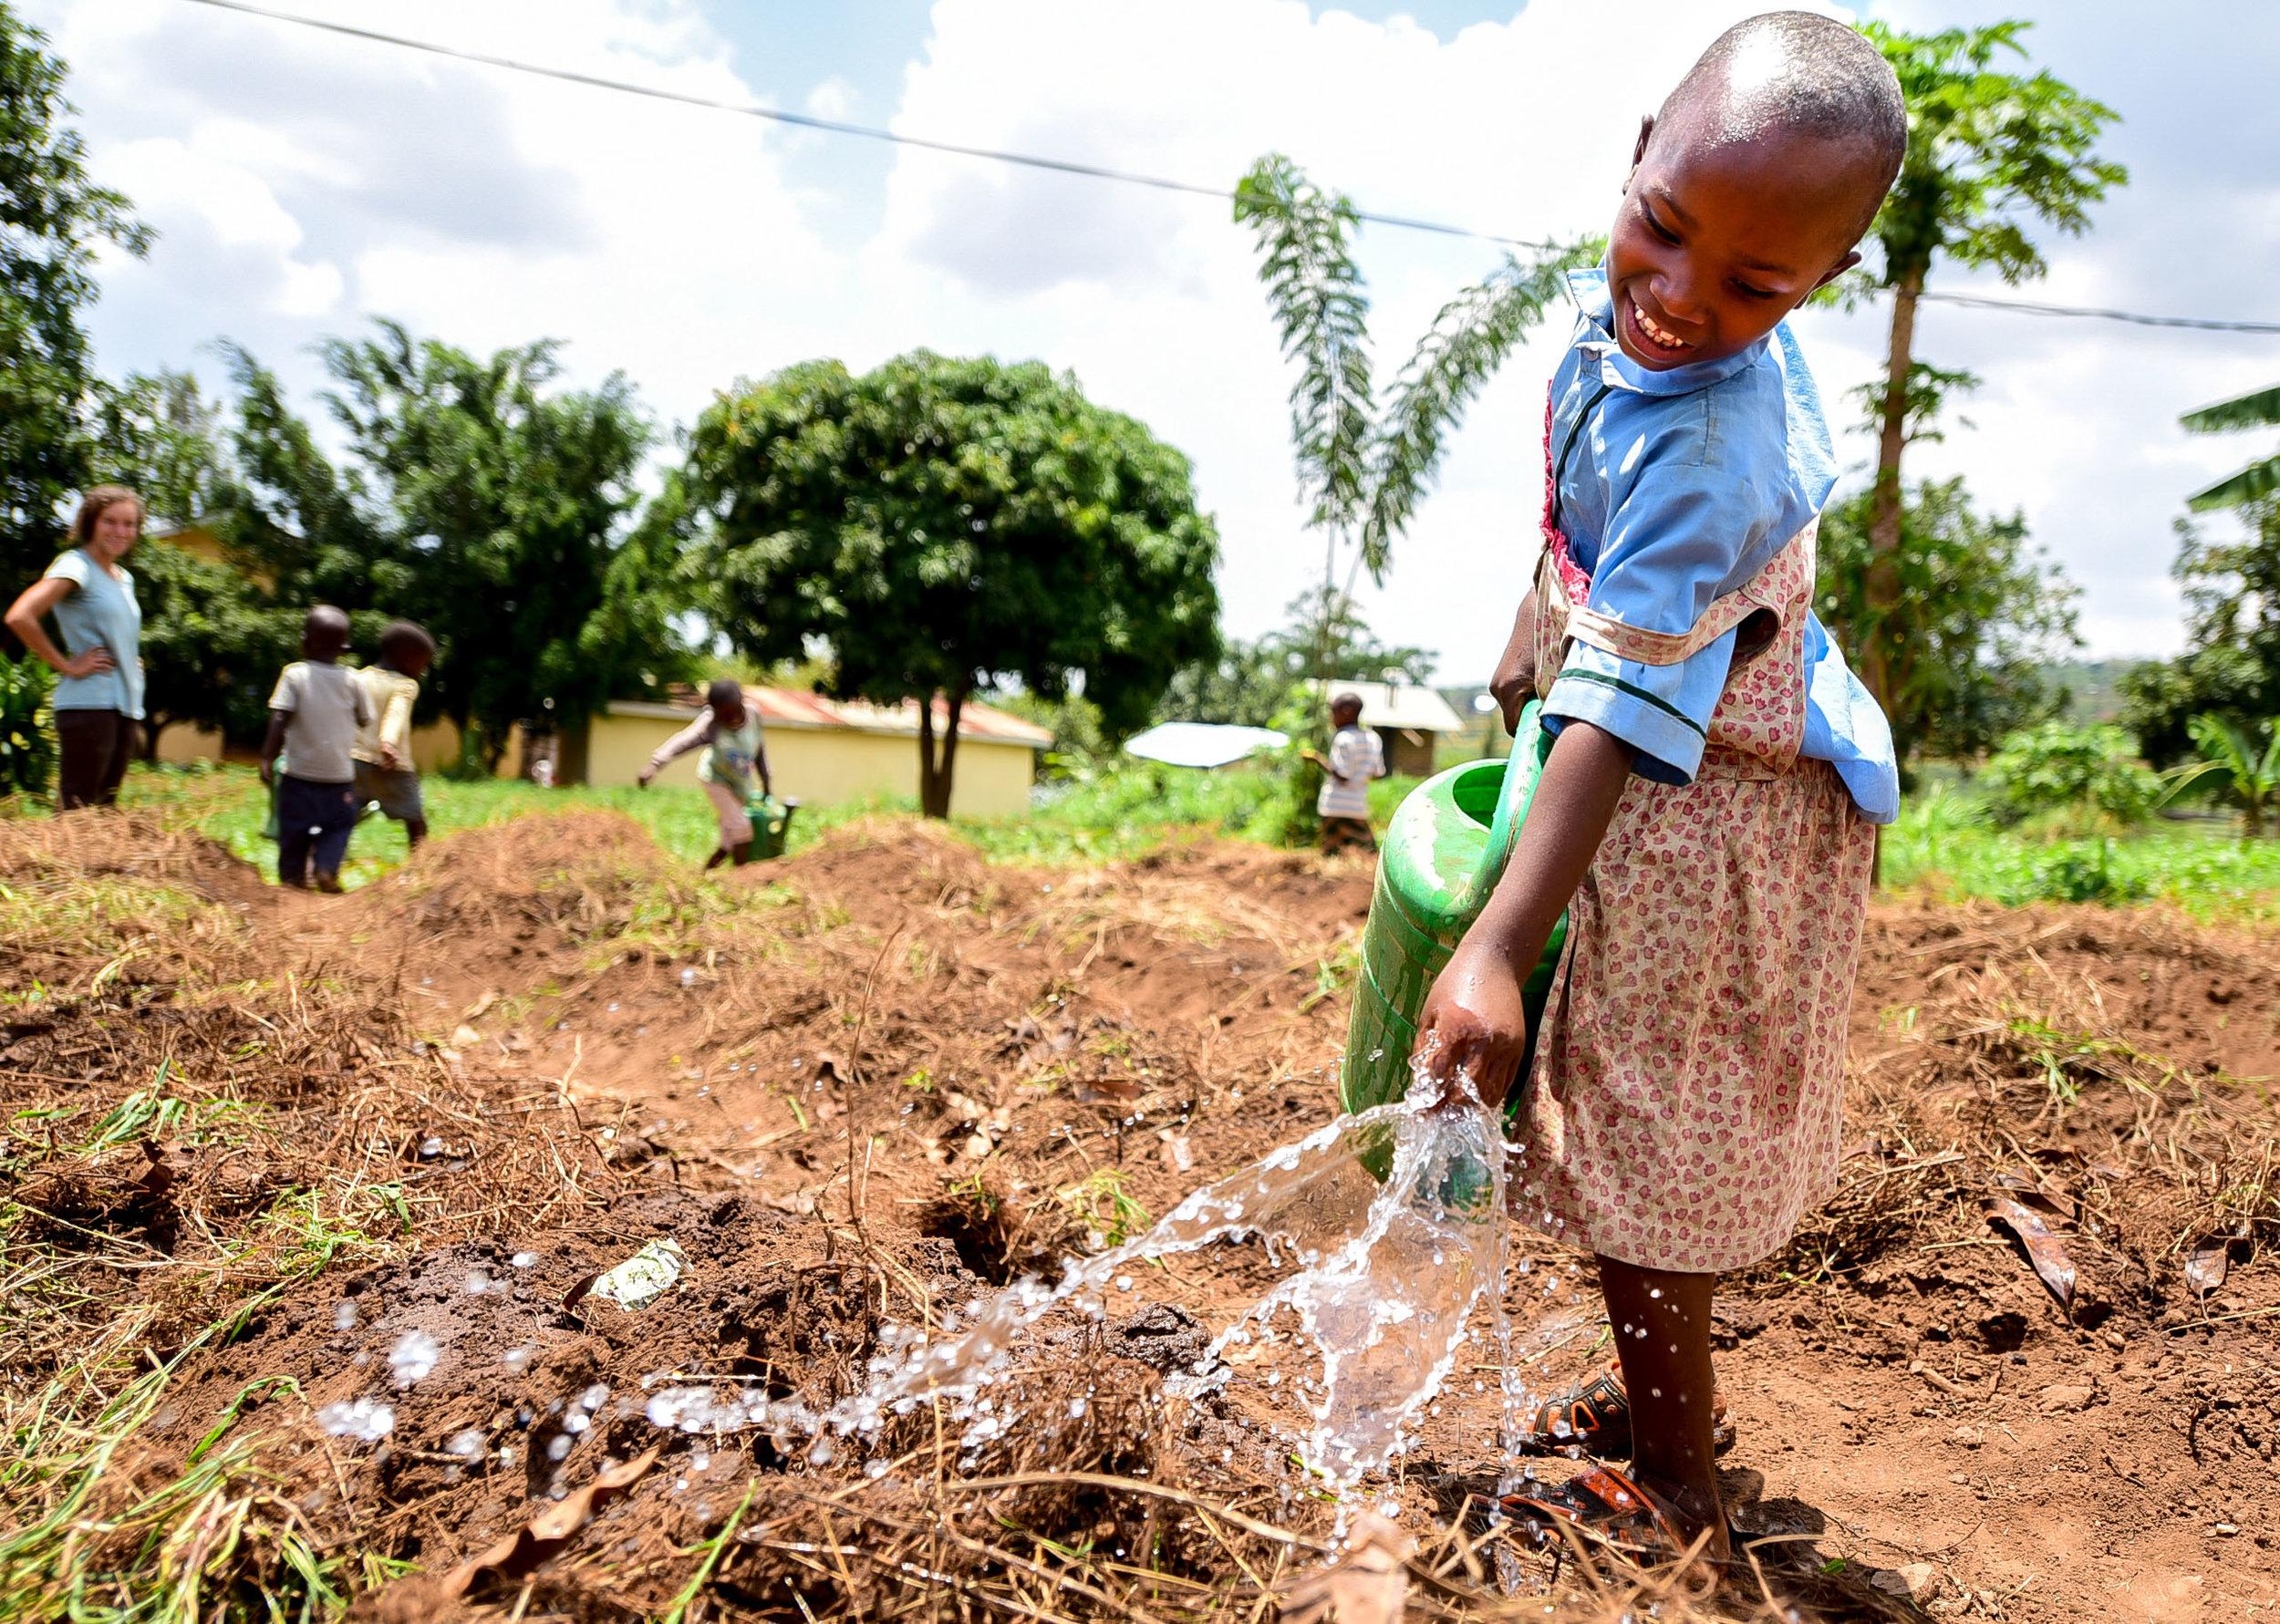 Iradukunda Florance, a member of GHI's Early Childhood Development program, helps water crops.